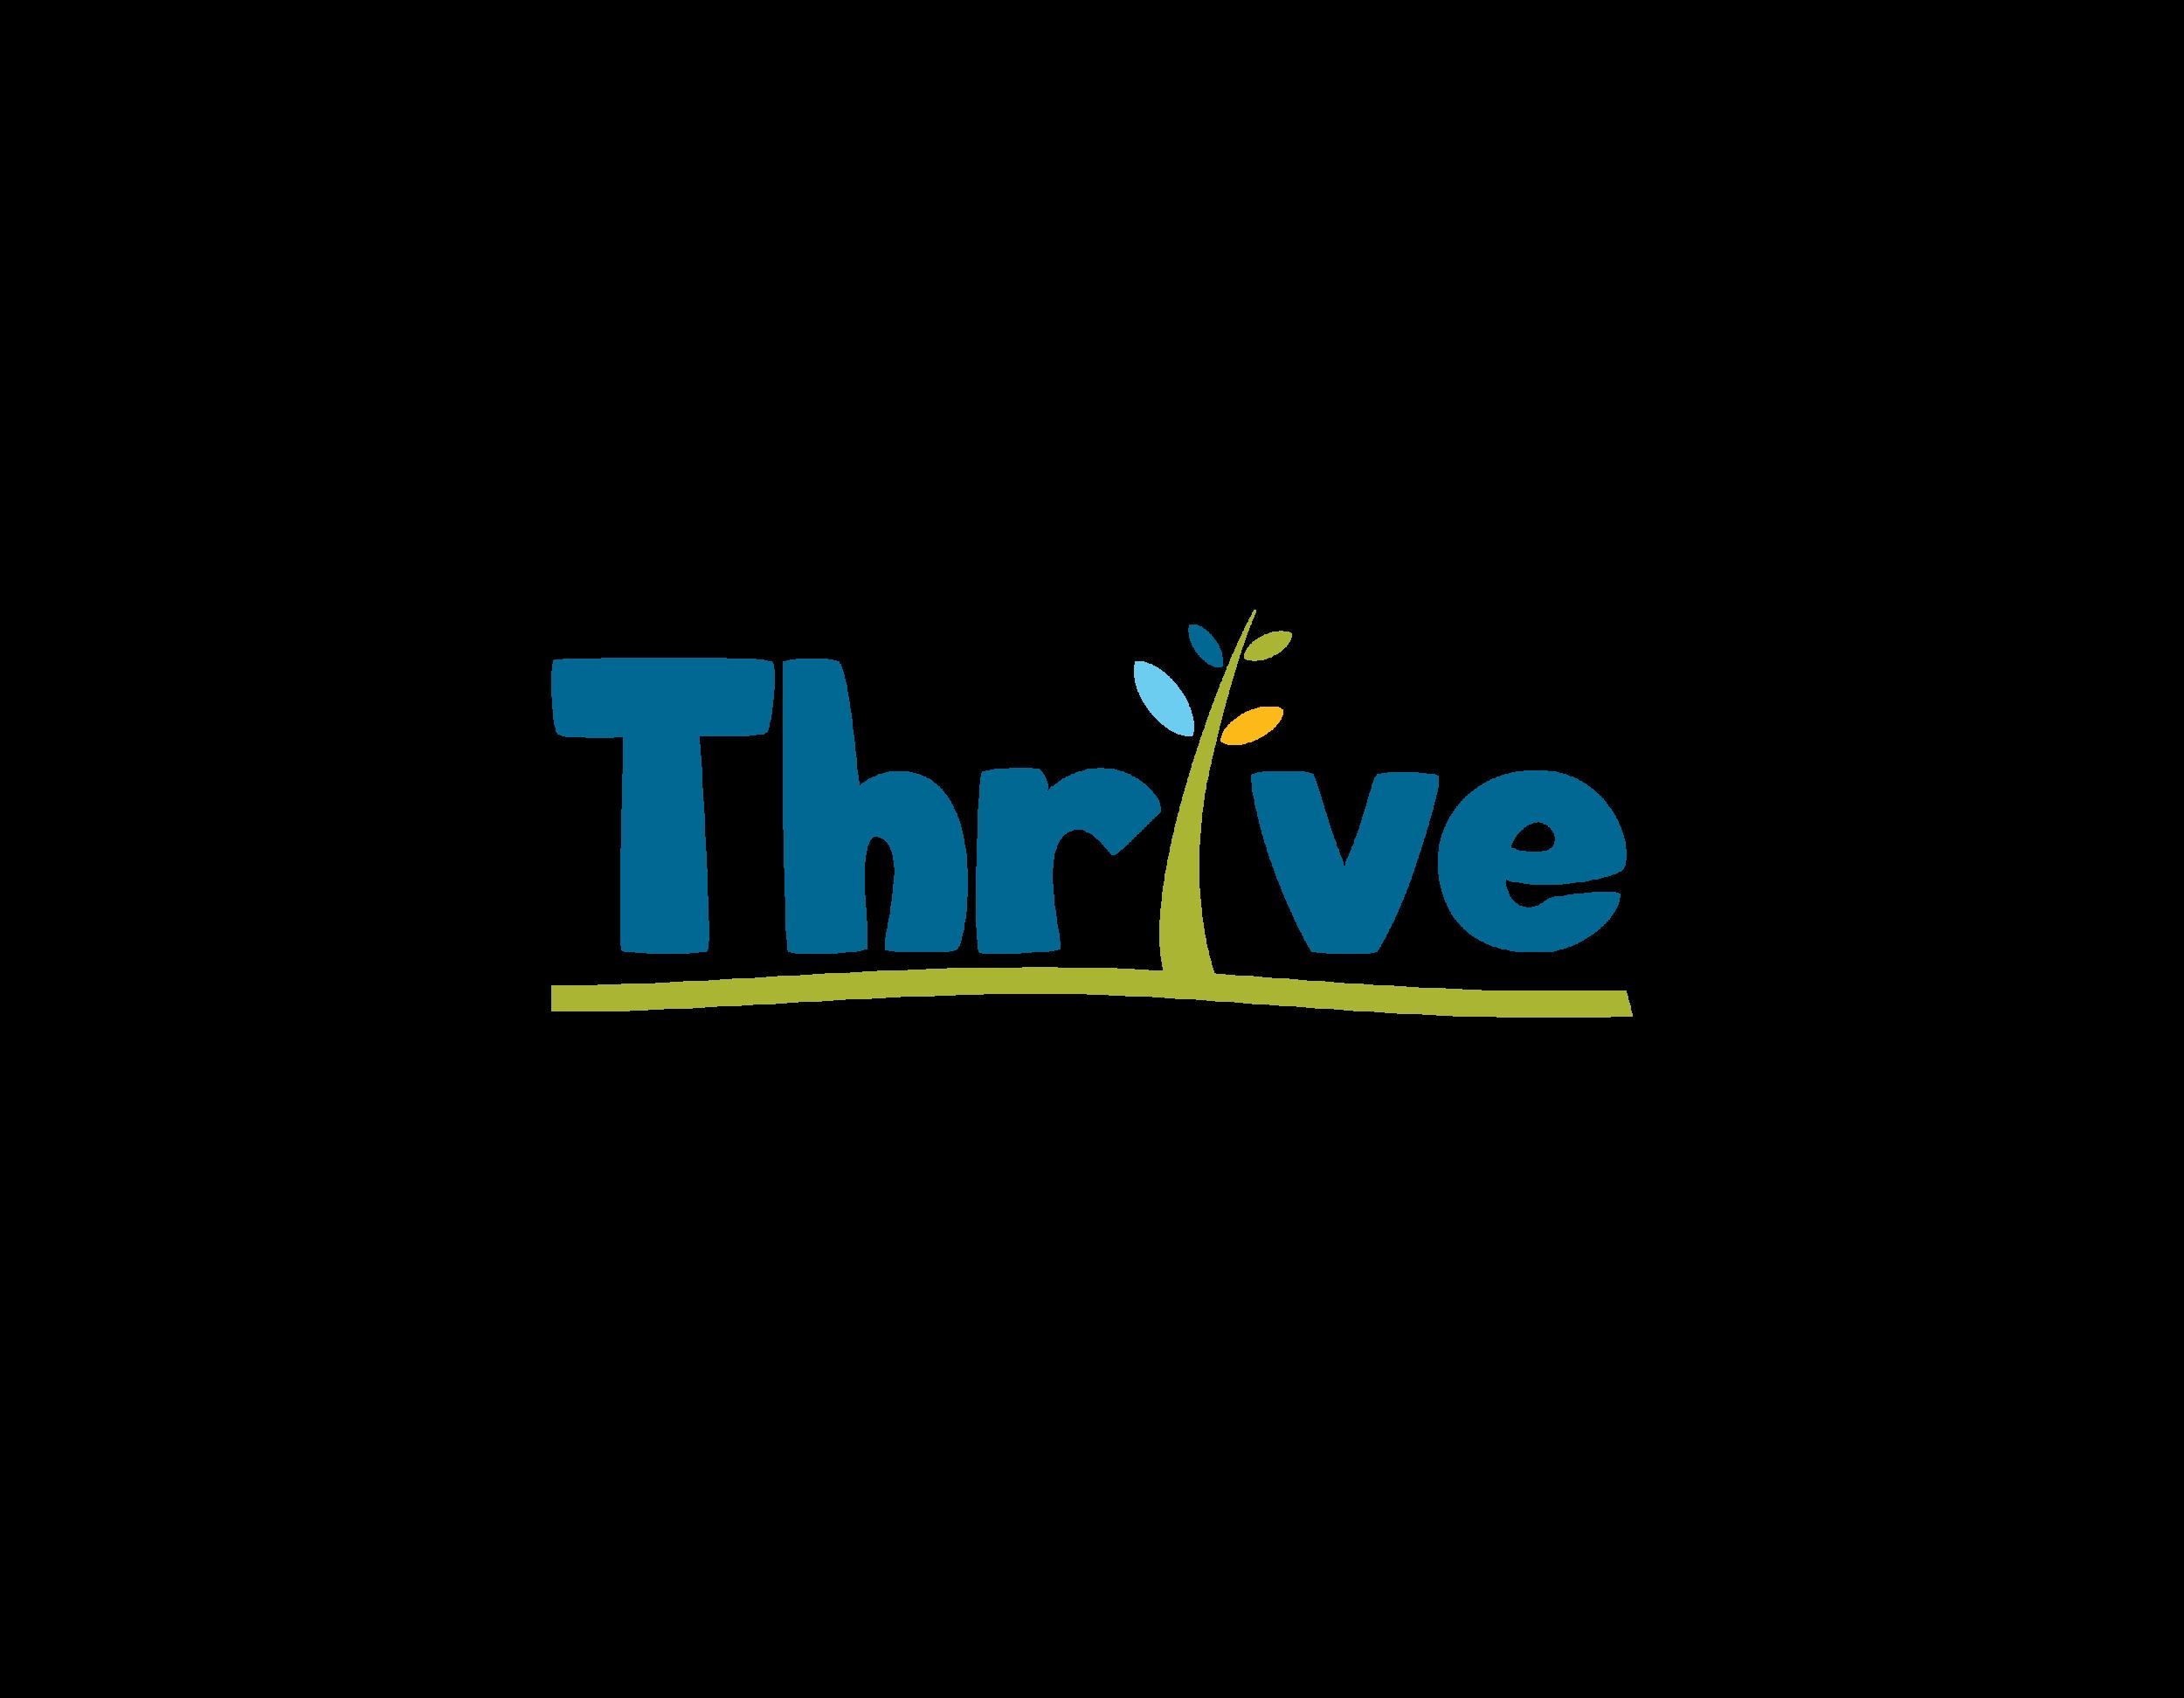 GHF_Thrive_Logo_Concepts_CMYK_Logo w- Tagline.png